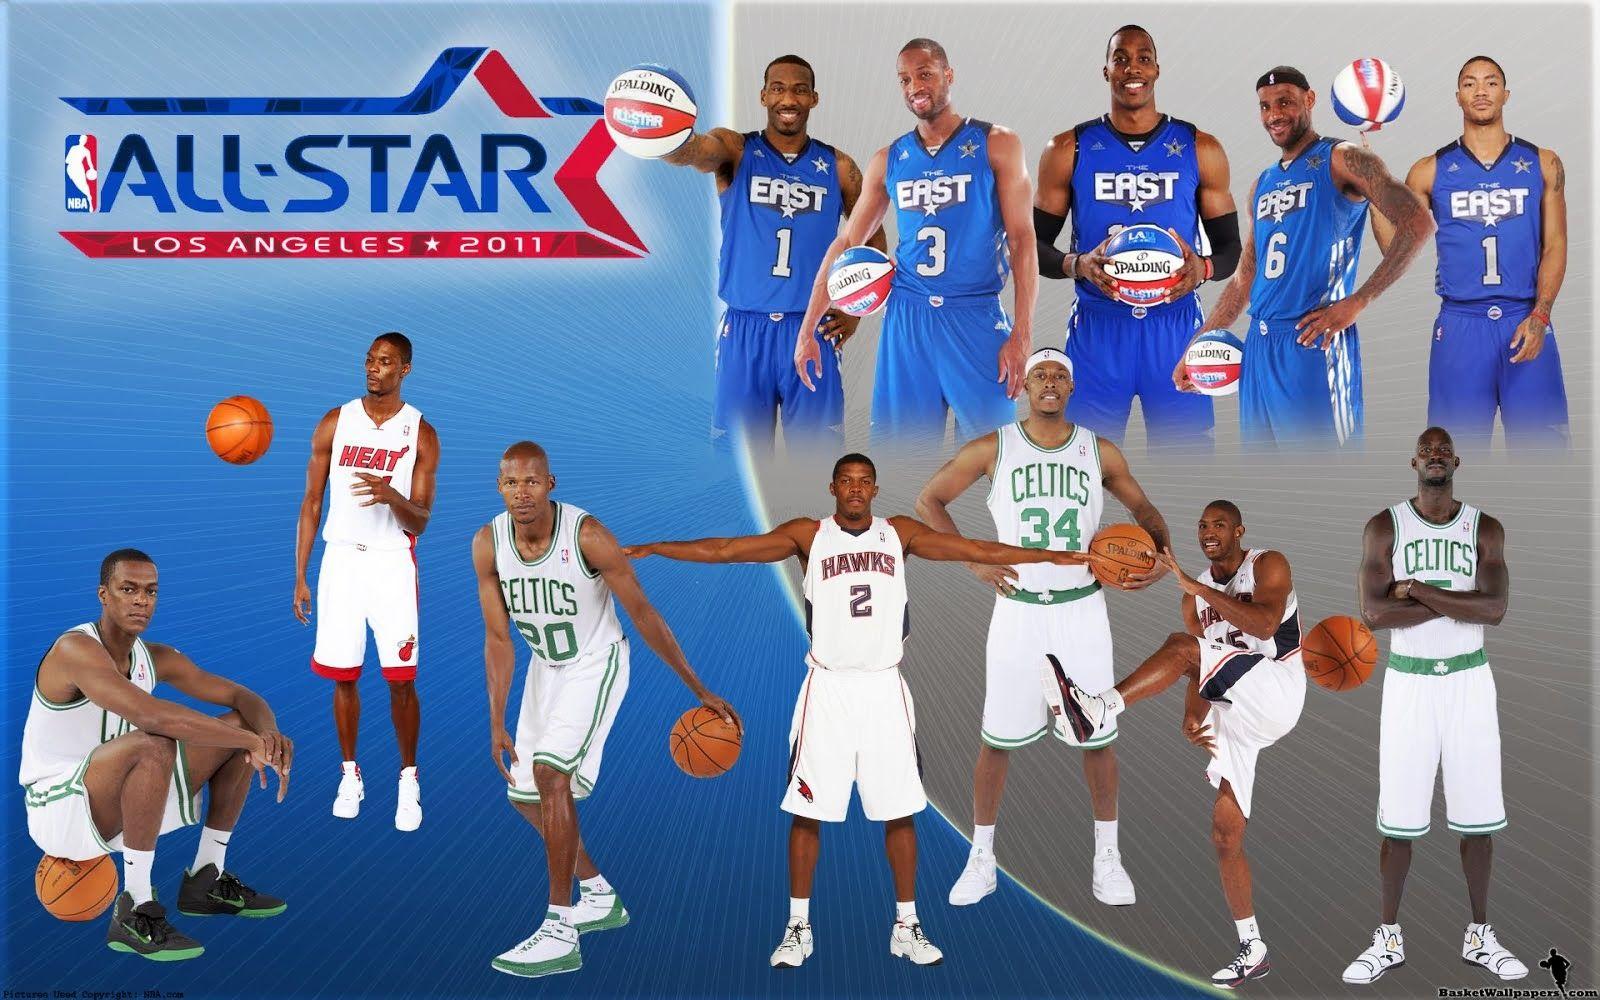 Nba Allstars Hd Backround Hd Backgrounds 19 Cool Hd Basketball Star Basketball All Star